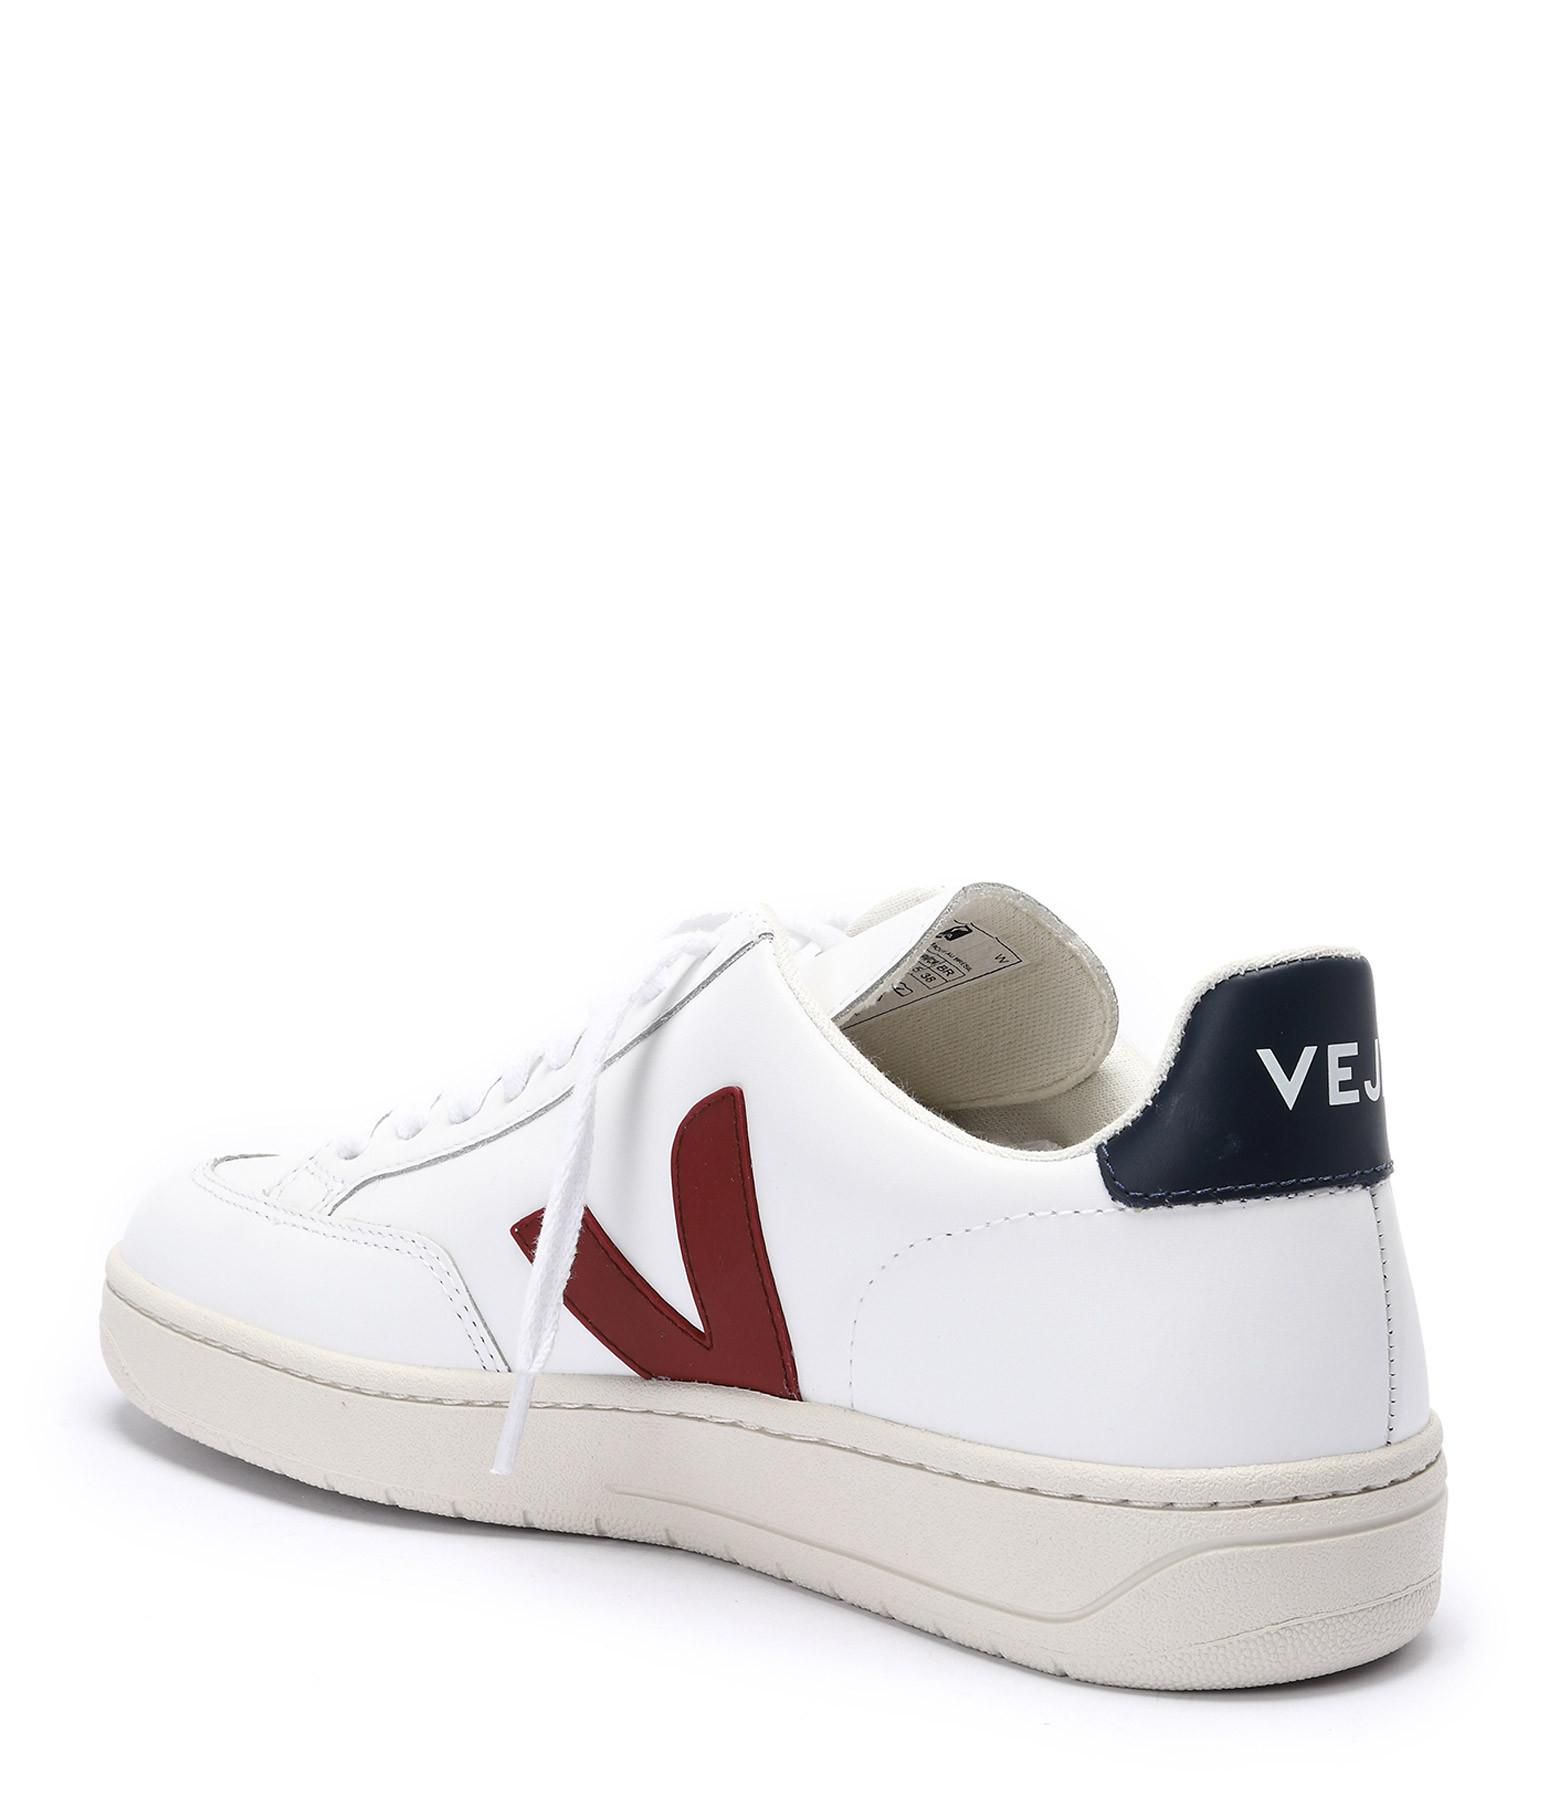 VEJA - Baskets V-12 Cuir Blanc Nautico